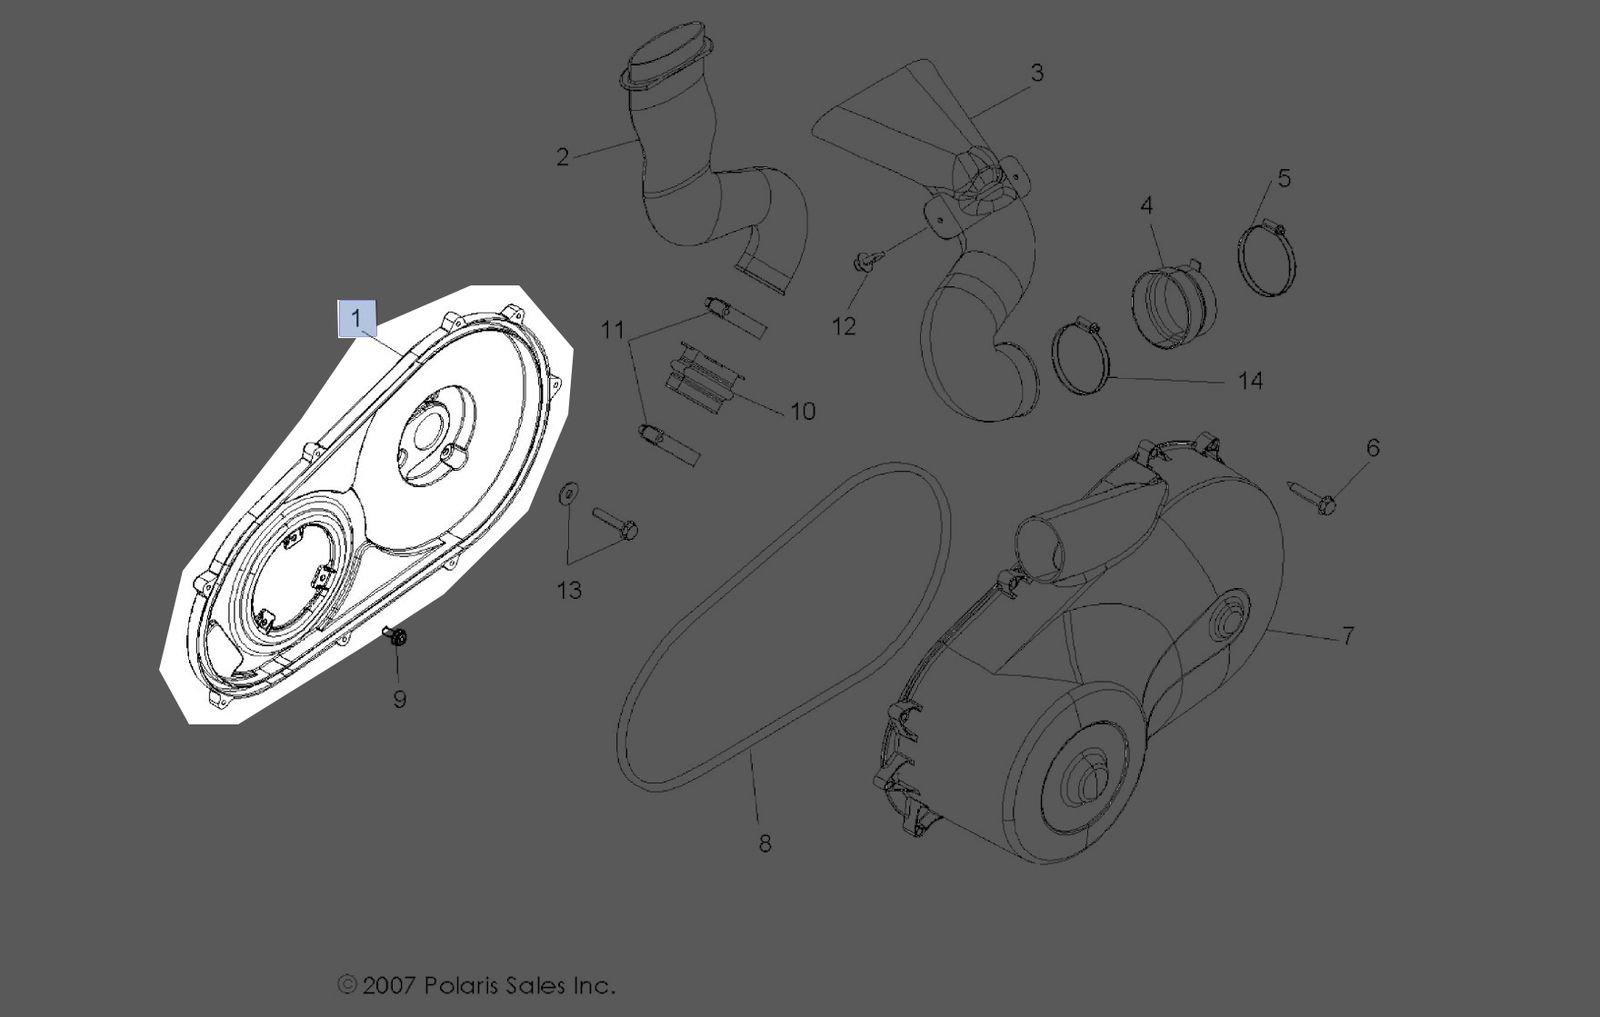 Polaris 2008-2010 Rzr 800 Rzr''S'' 800 Intl Cover Clutch Inner 5436569 New Oem